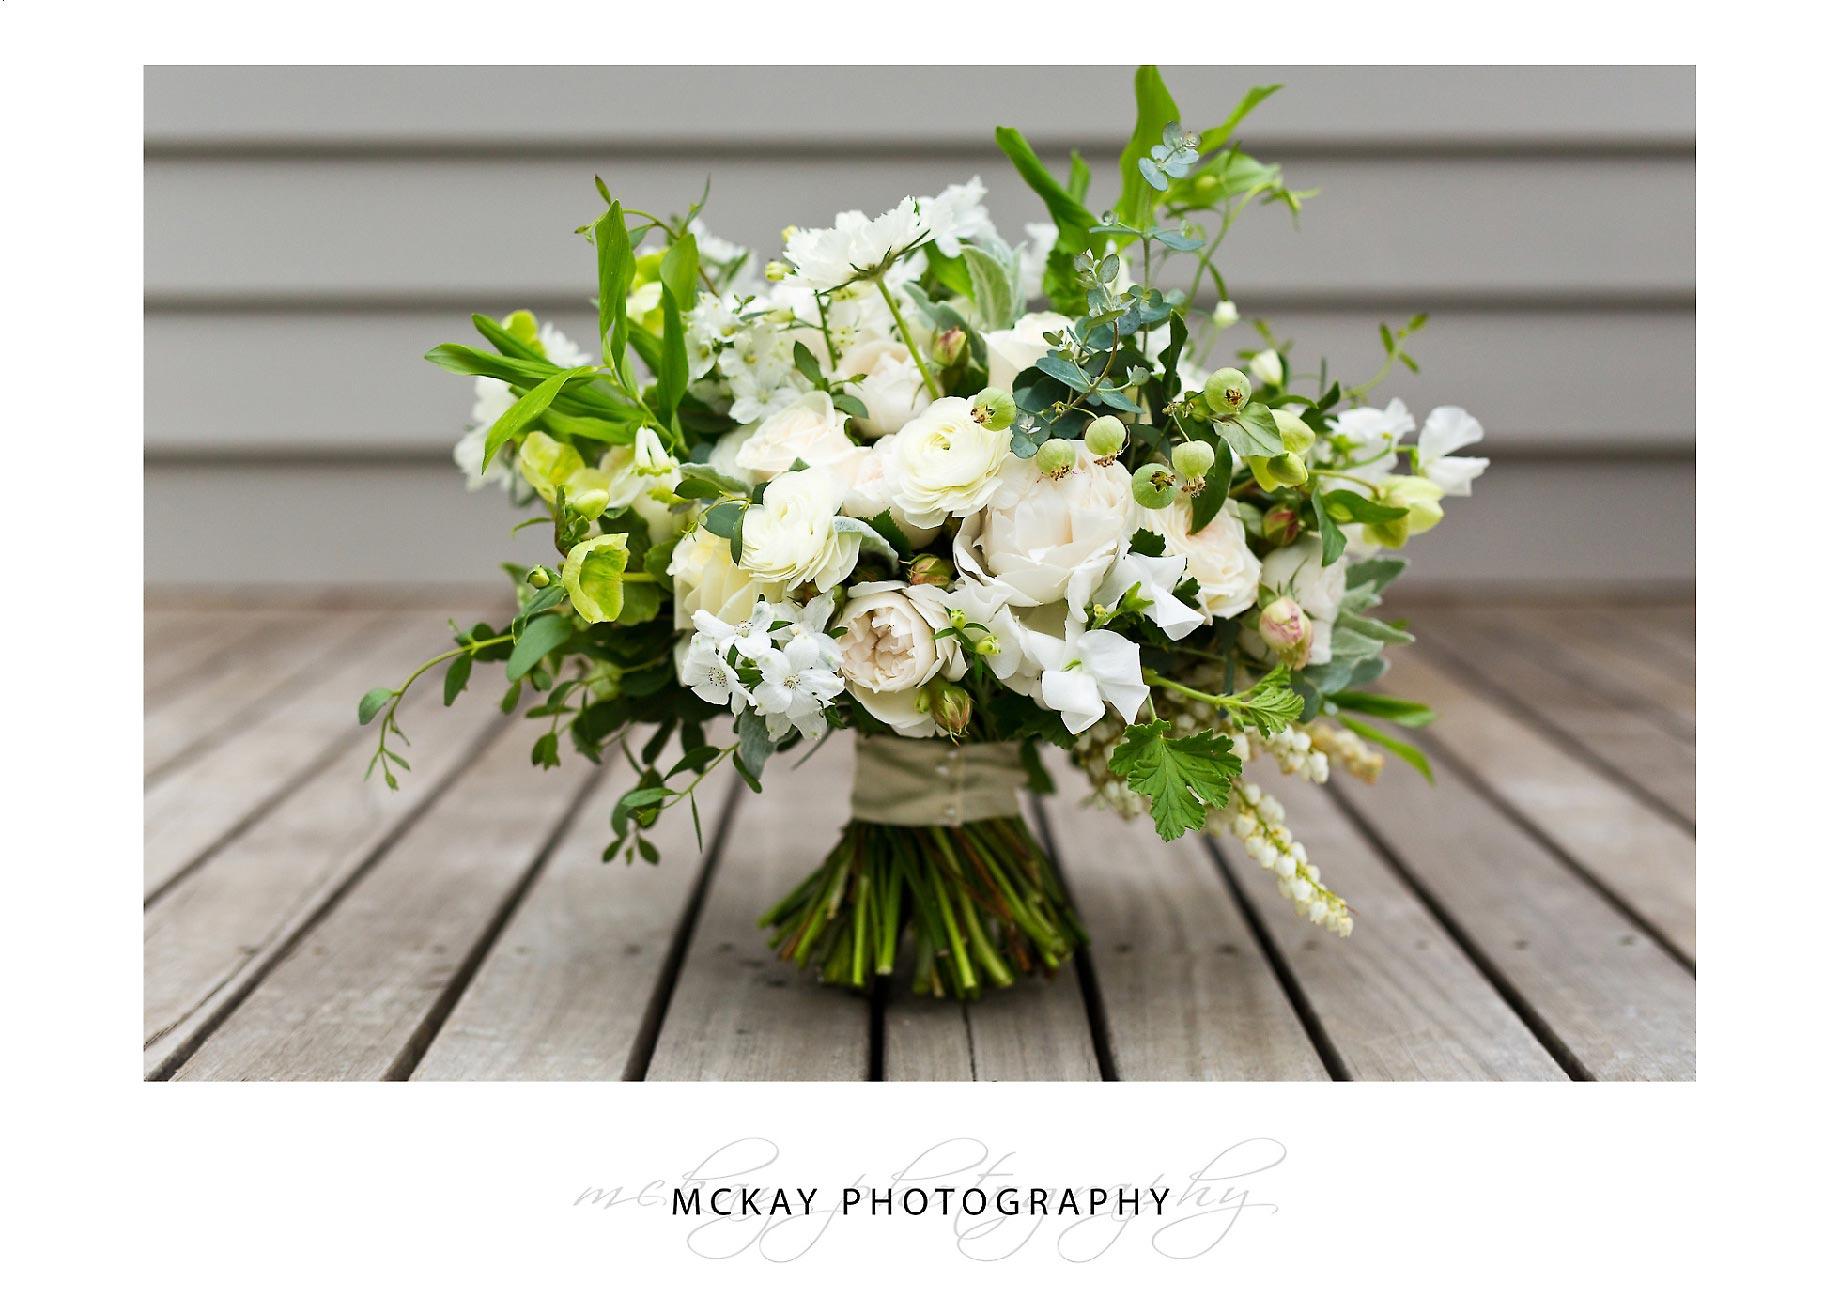 Affair with George wedding bouquet